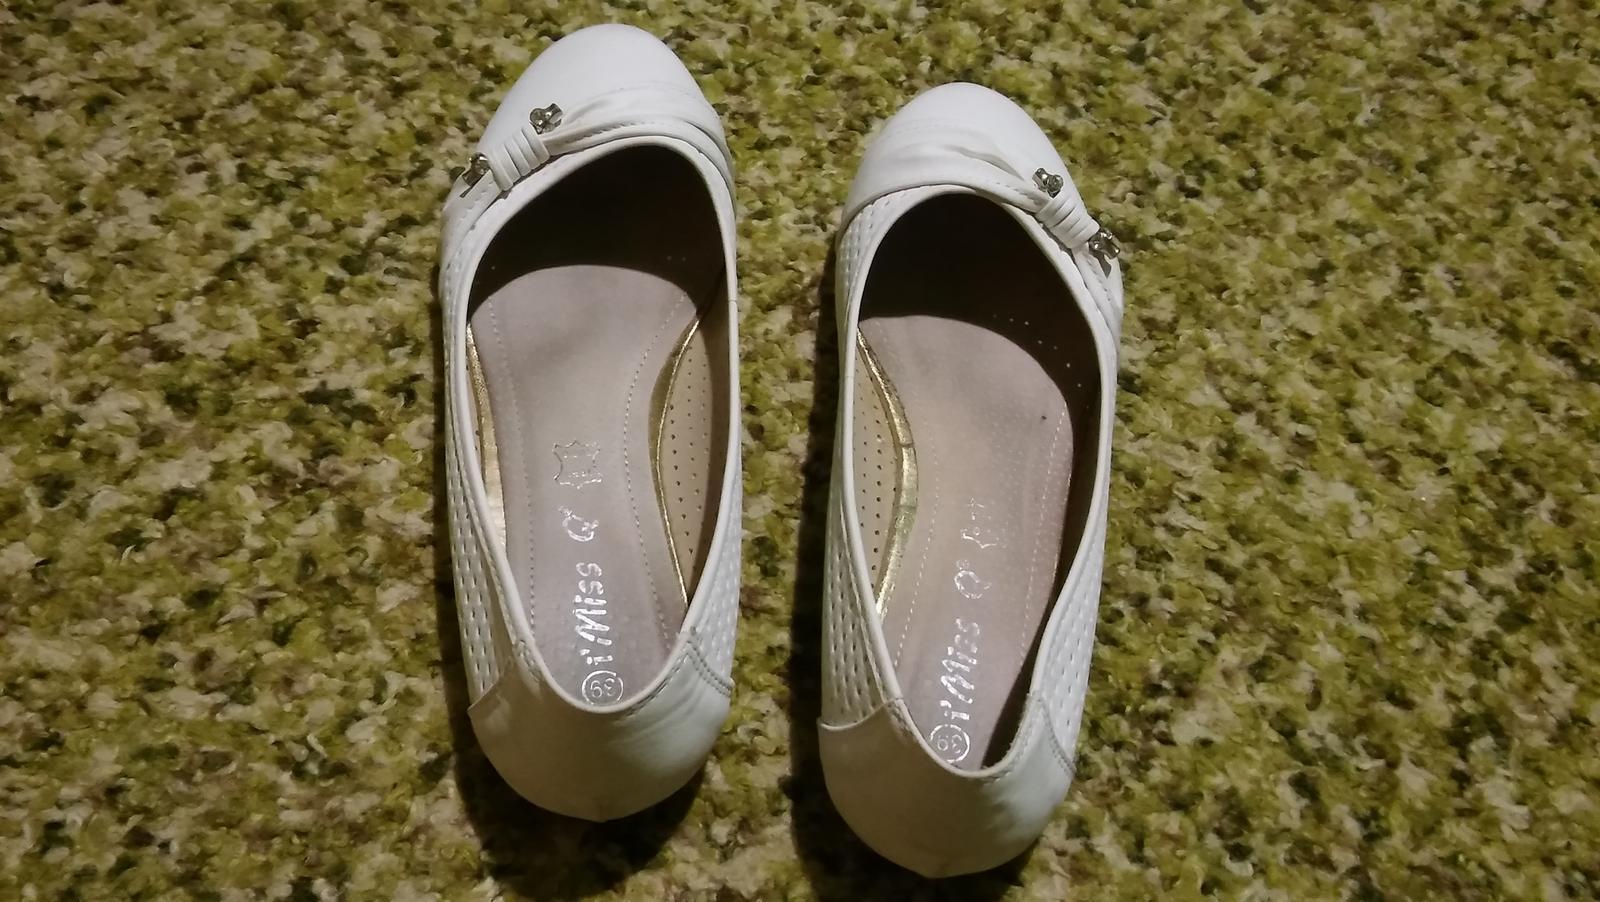 biele baleriny - Obrázok č. 3